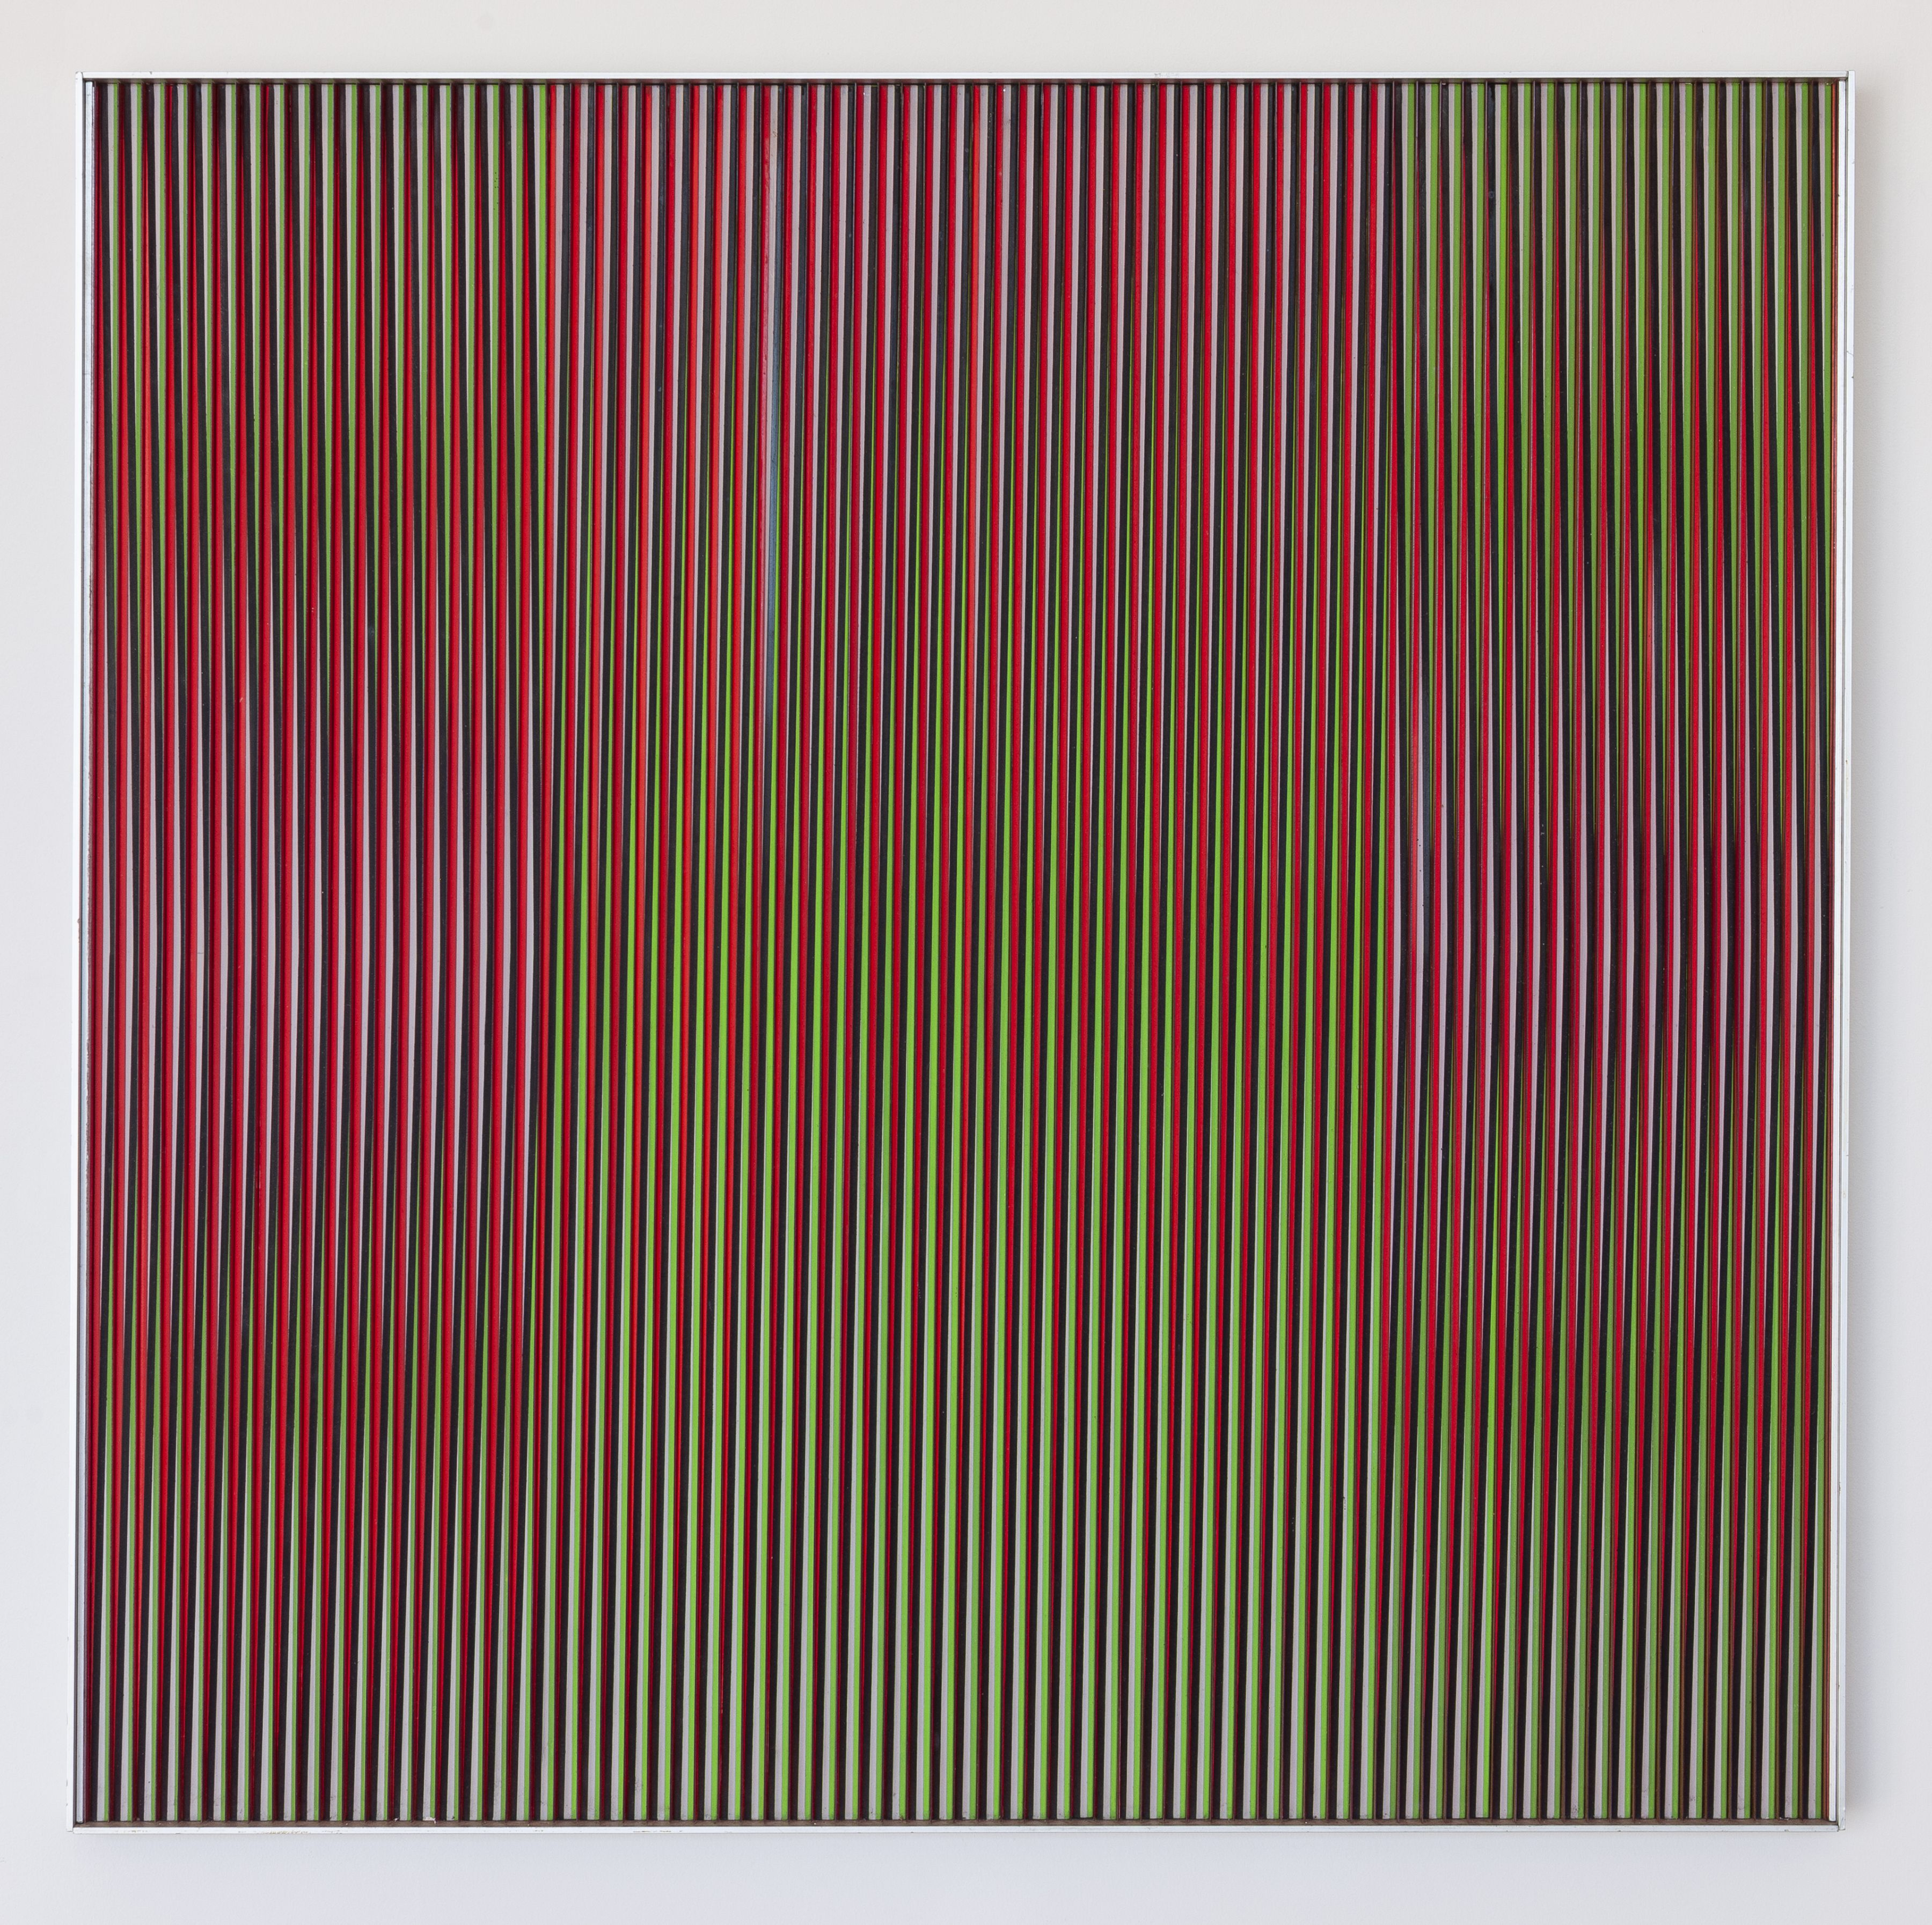 Carlos Cruz-Diez,Physichromie 887, 1976,Aluminum and Plexiglass,31 1/2 x 31 1/2 in. (80 x 80 cm.)